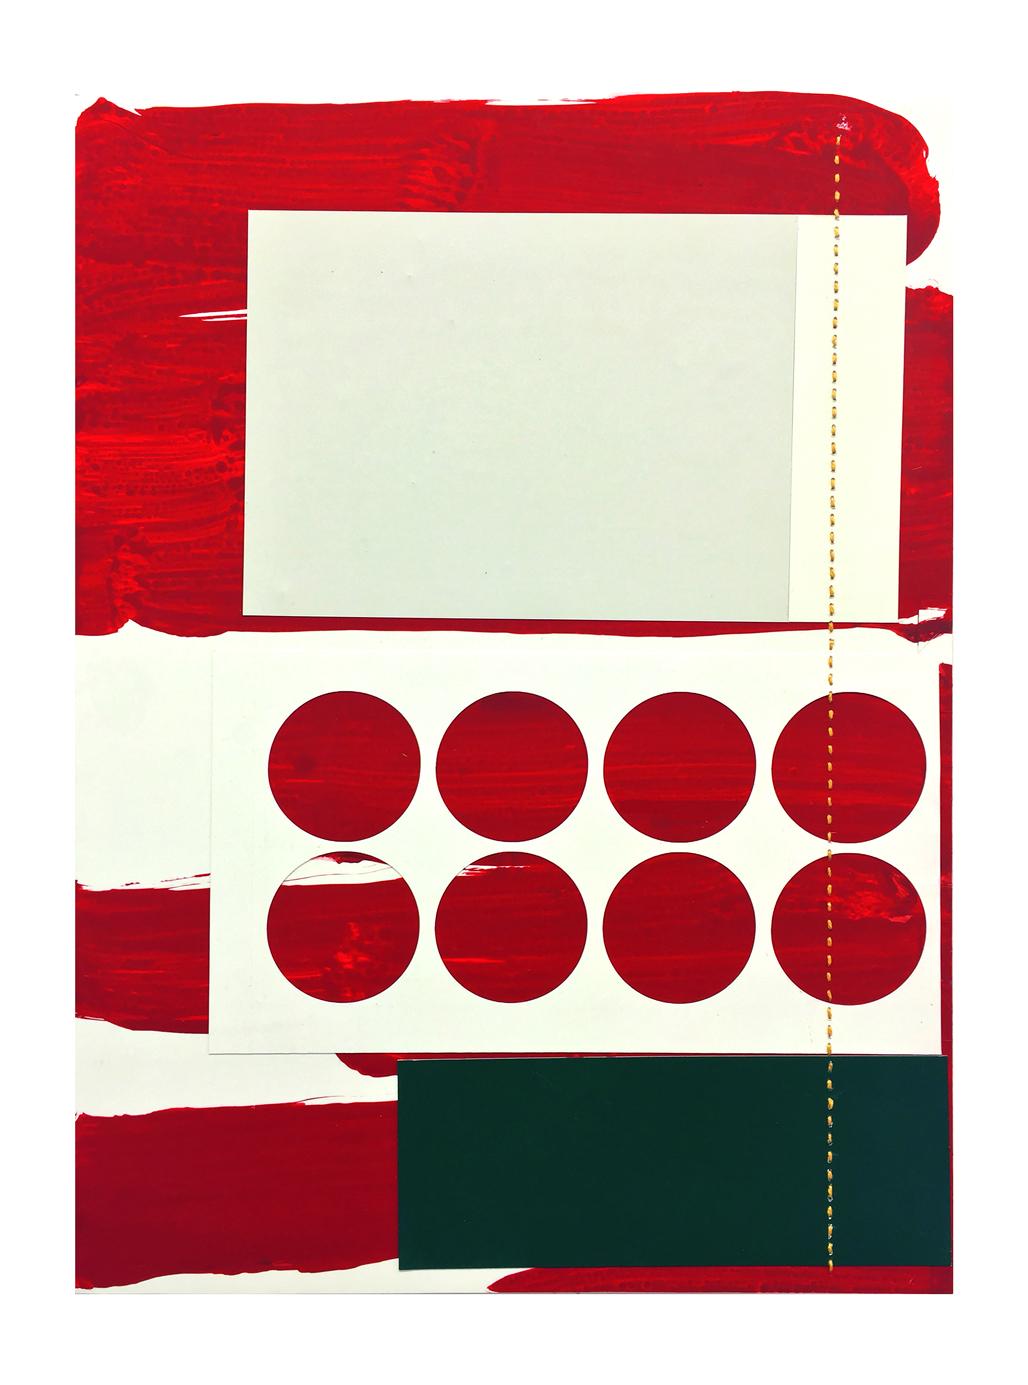 Wave sturm,acrylic, collage on yponpaper 33,5x25cm